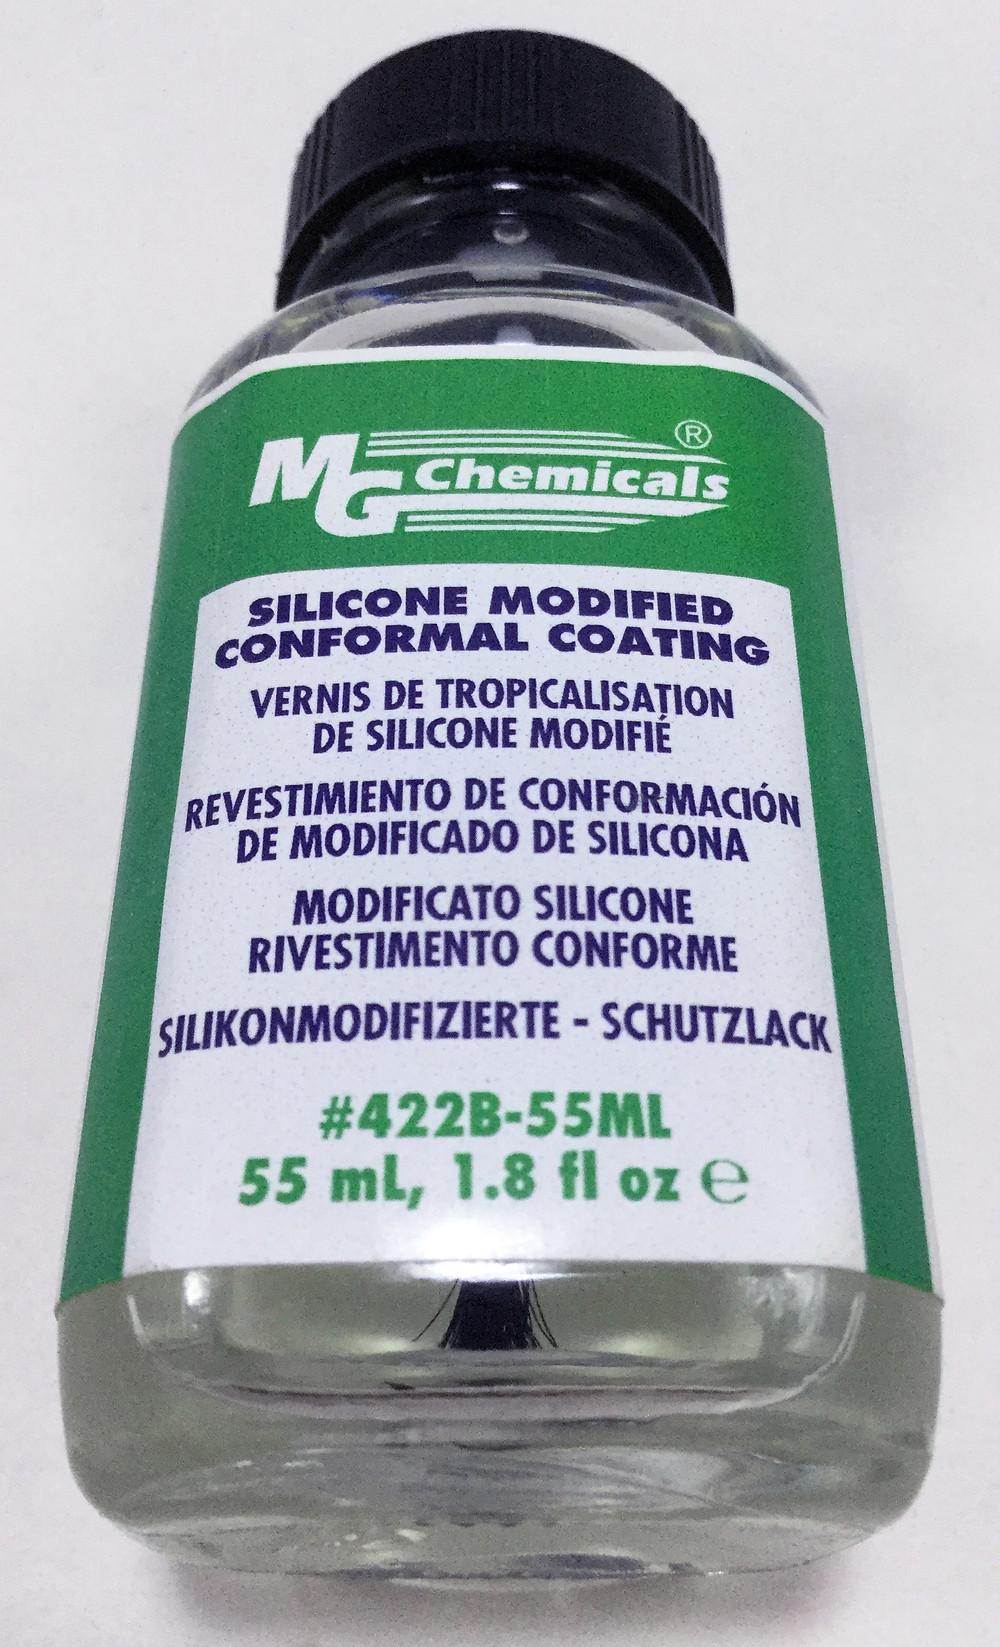 MG Chemicals Conformal Coating